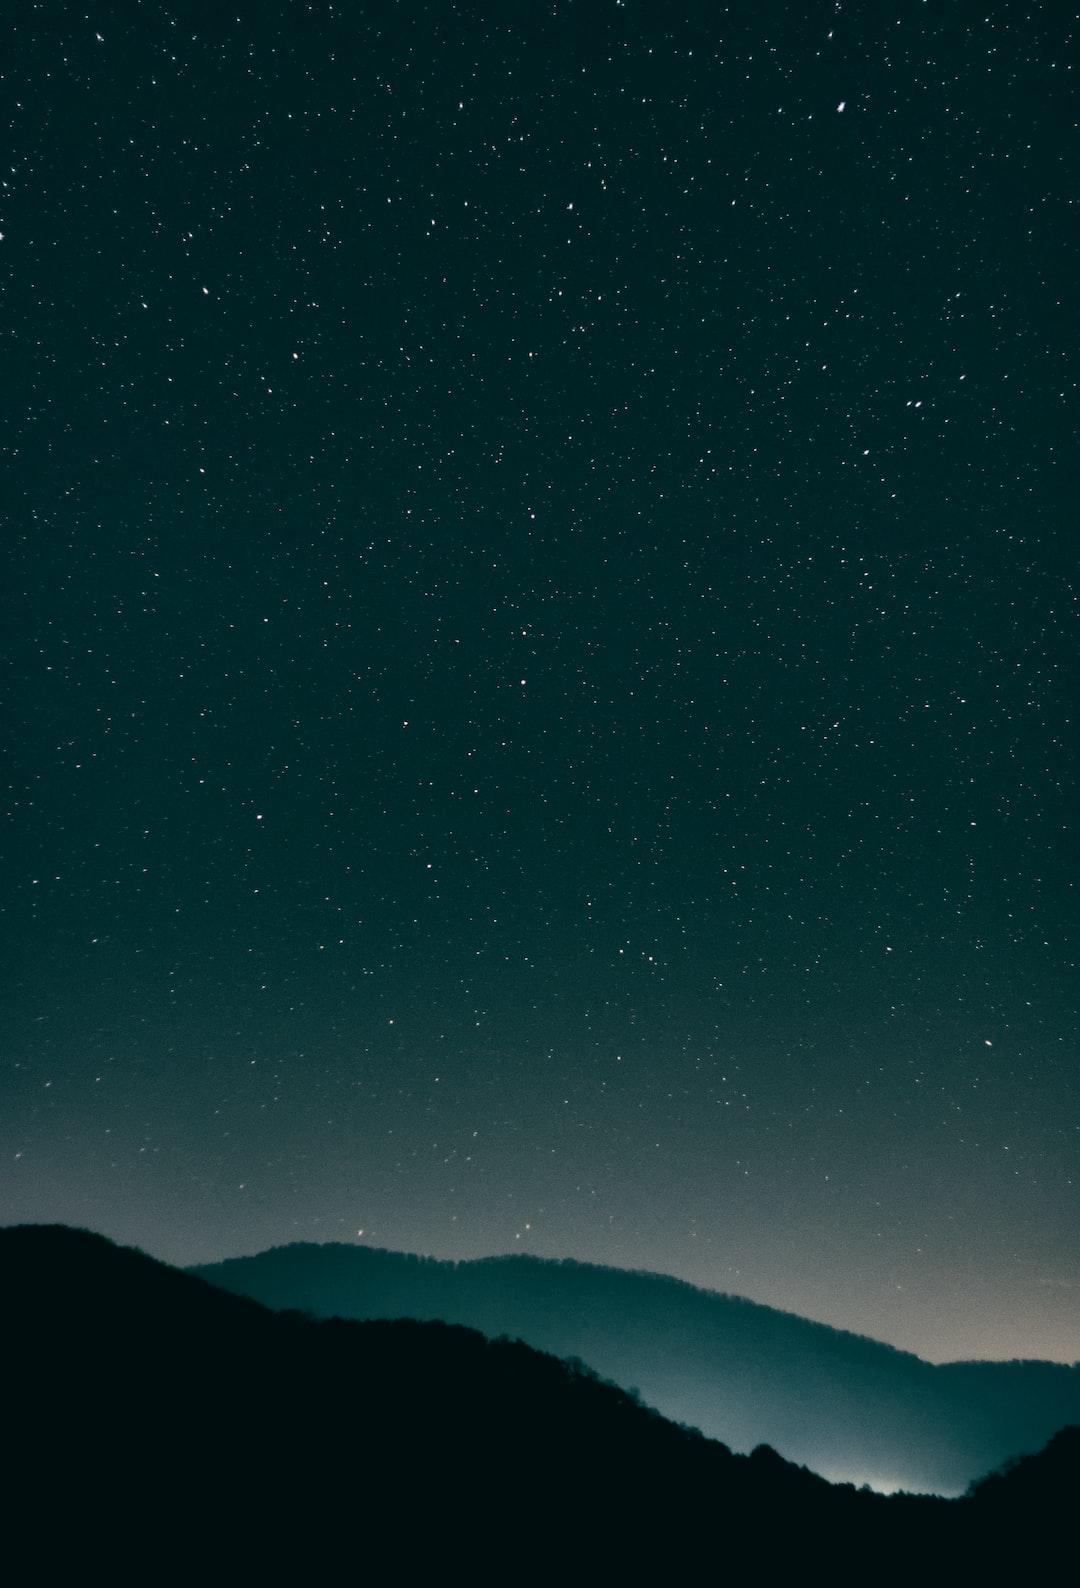 Langit Malam Portrait 20 Best Free Star Night Milky Way And